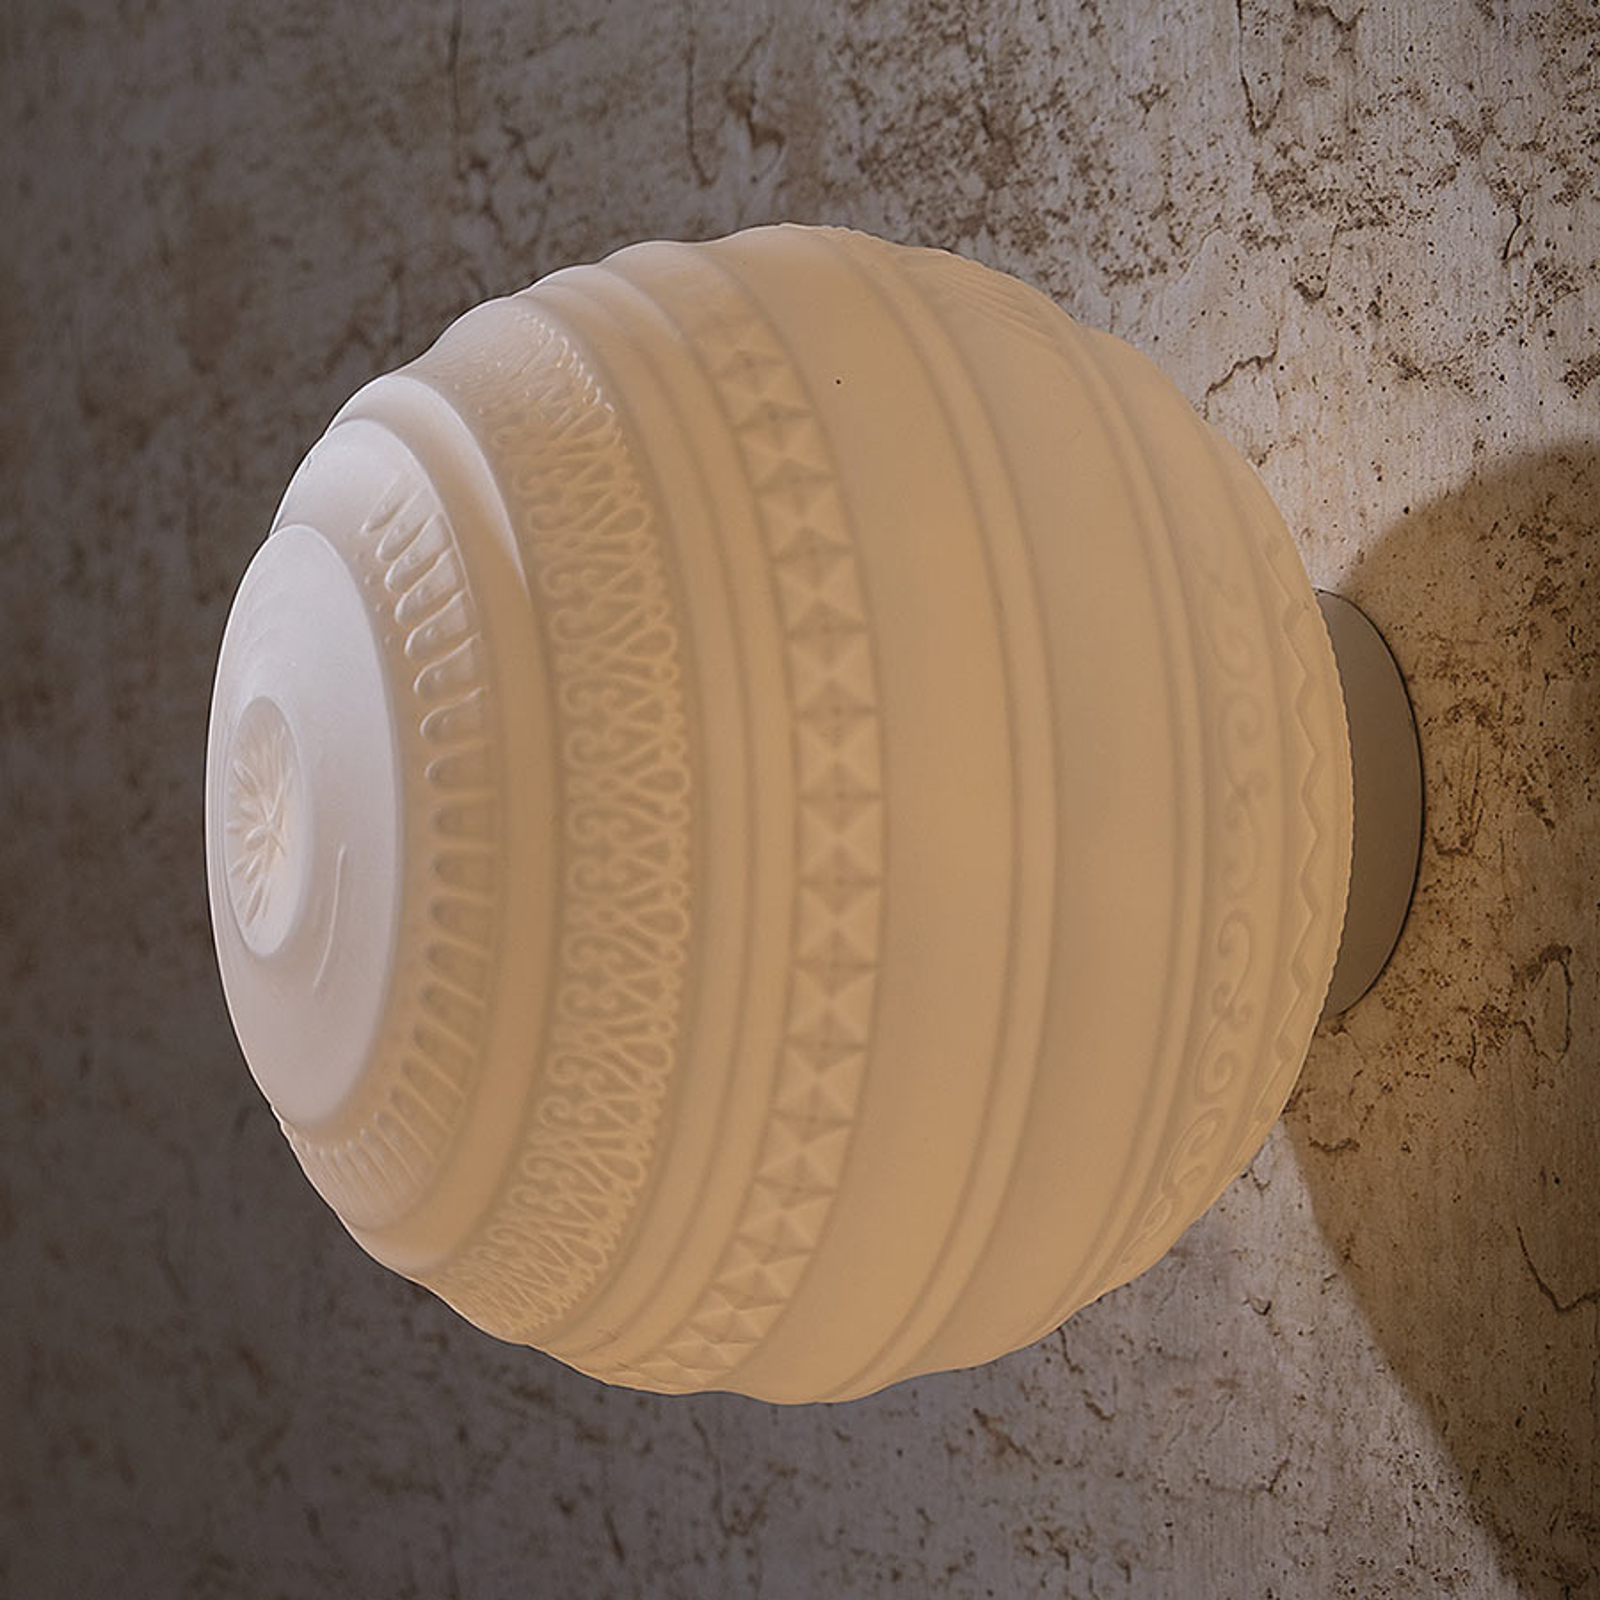 Lampa sufitowa Braille, dmuchane szkło, 25cm